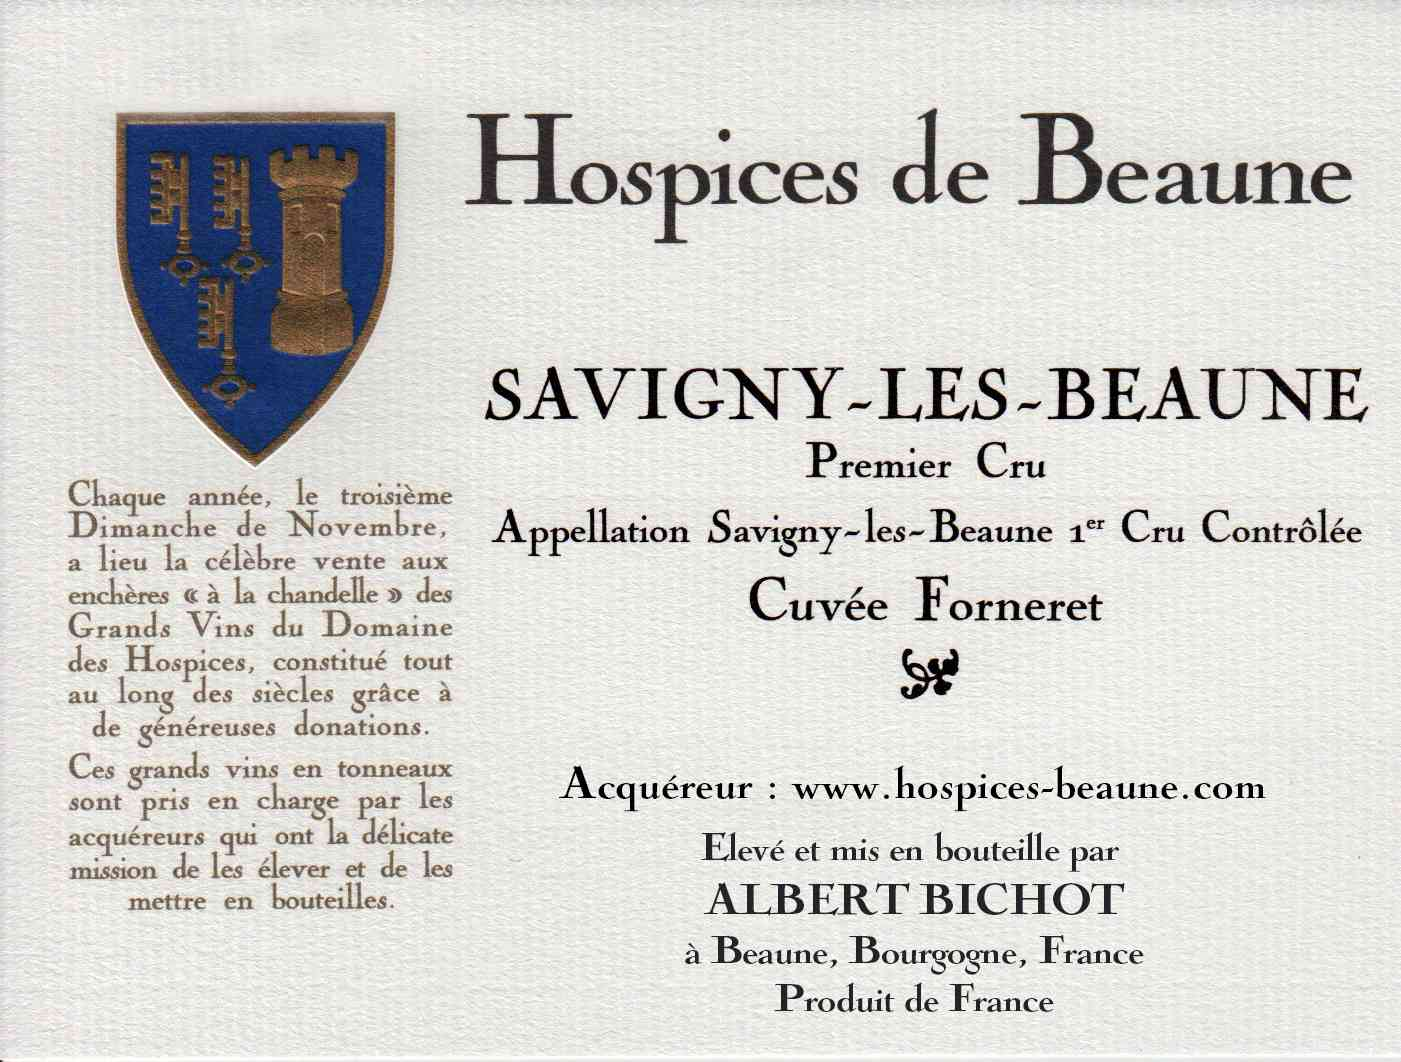 Encheres-auction-HospicesdeBeaune-AlbertBichot-SavignyLesBeaune-PremierCru-Cuvee-Forneret